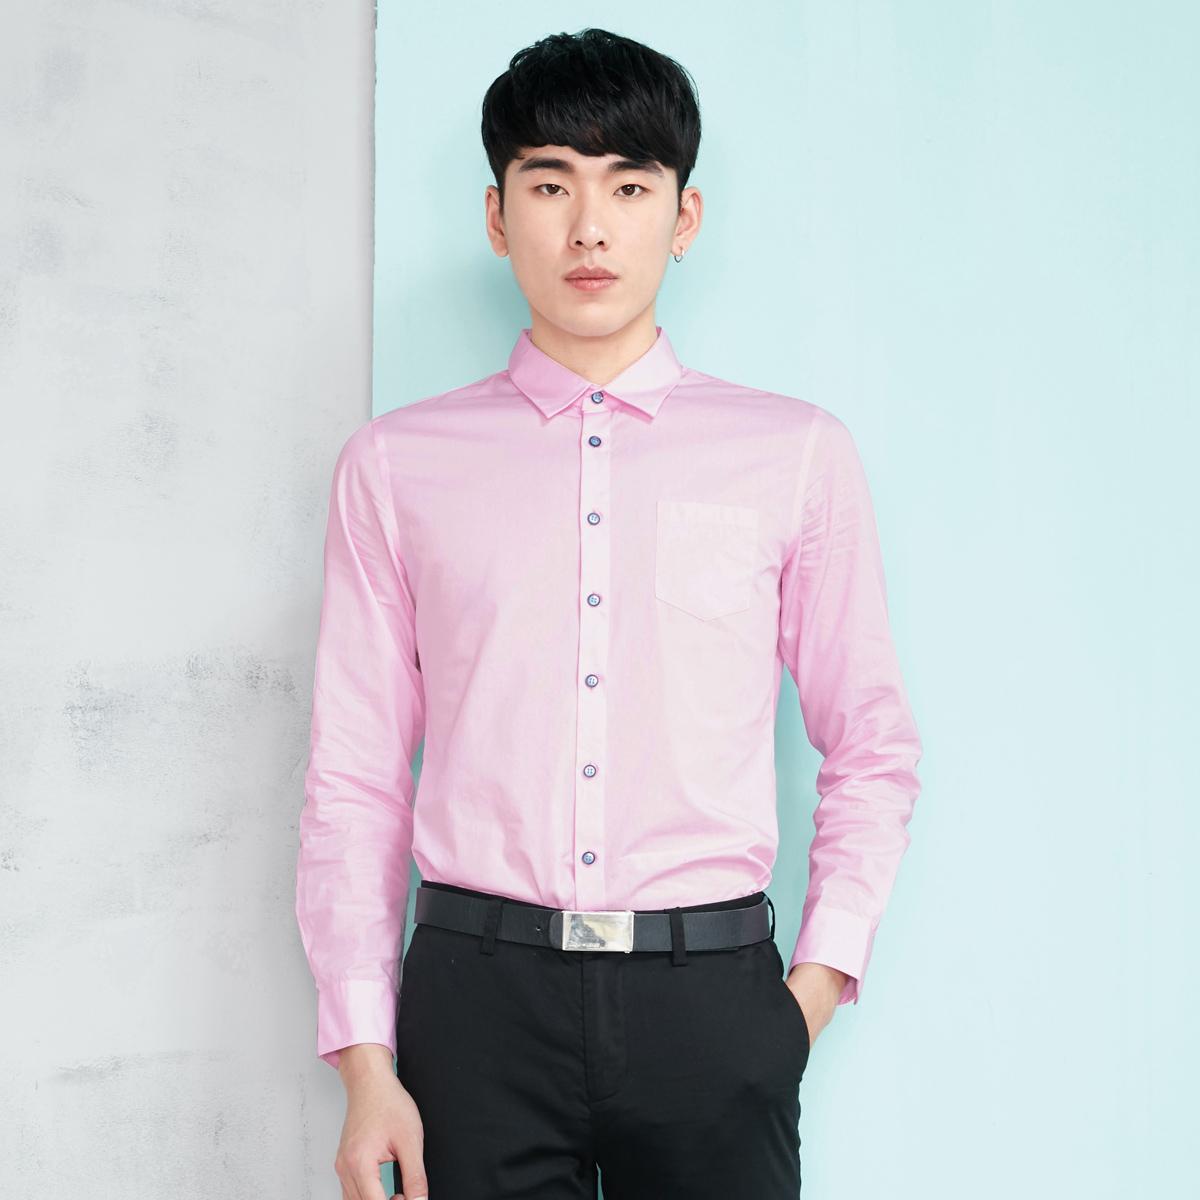 KONZEN商務簡約純色長袖純棉襯衫